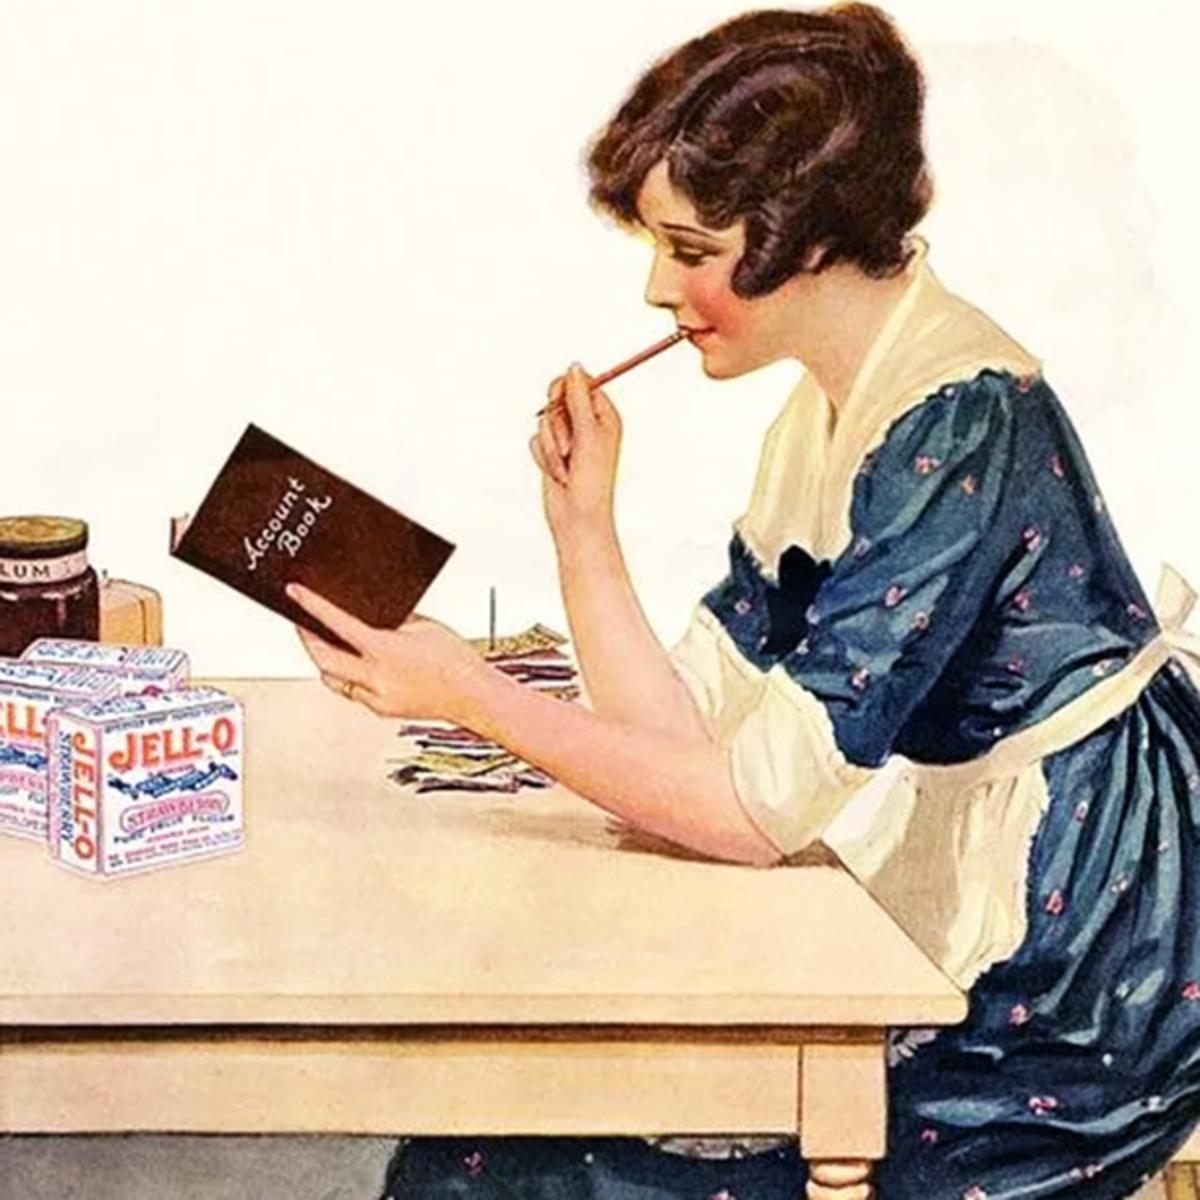 Selecting a Jell-O recipe